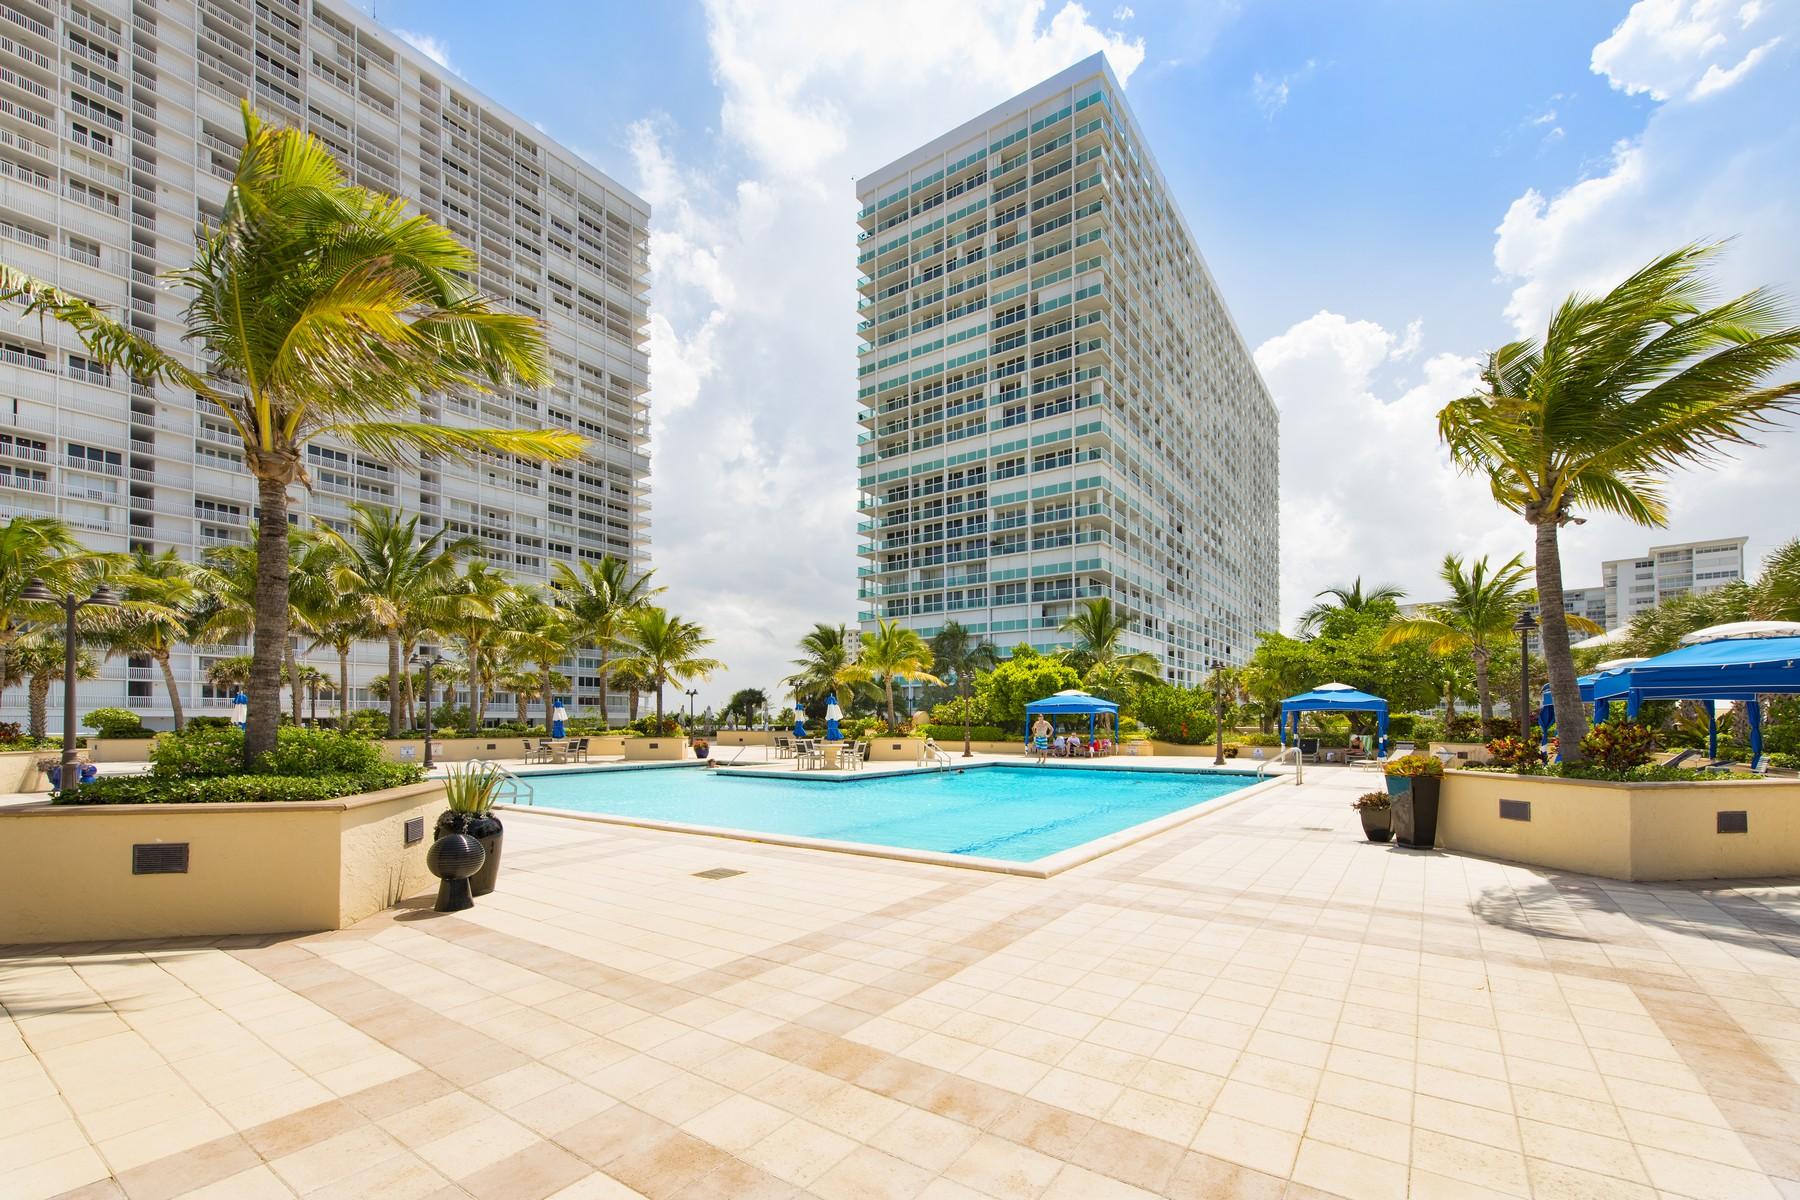 Condomínio para Venda às 2100 S. Ocean Ln. #1902 2100 S Ocean Ln #1902 Fort Lauderdale, Florida 33316 Estados Unidos